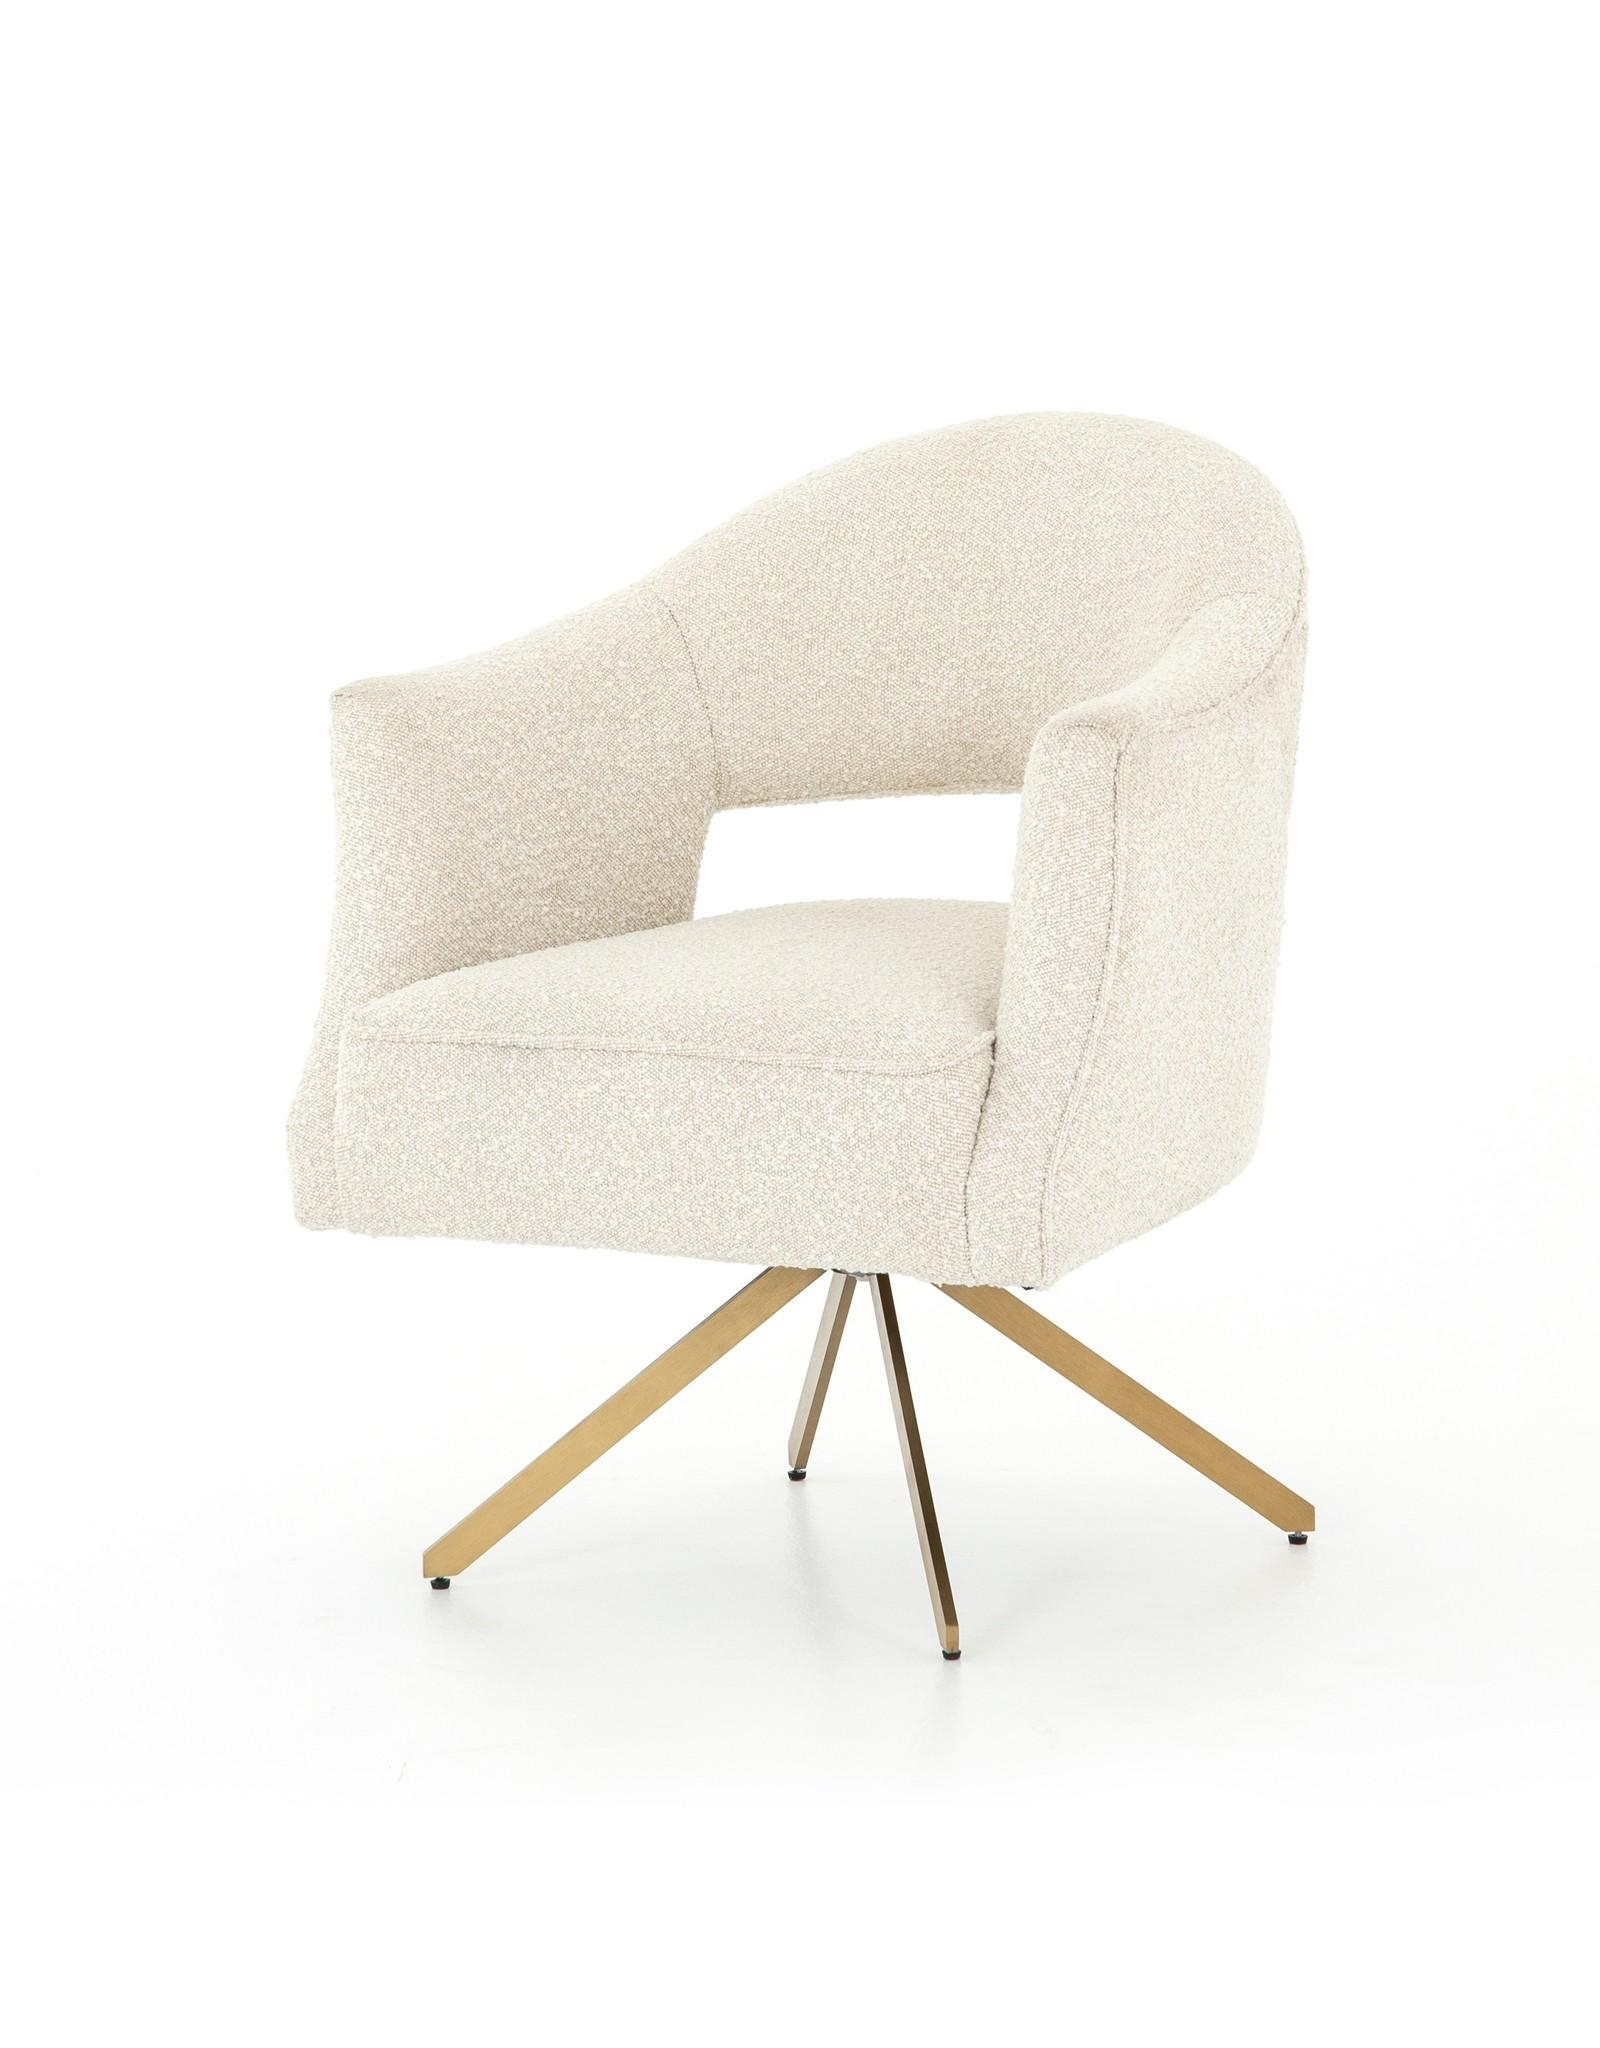 *Adara Desk Chair